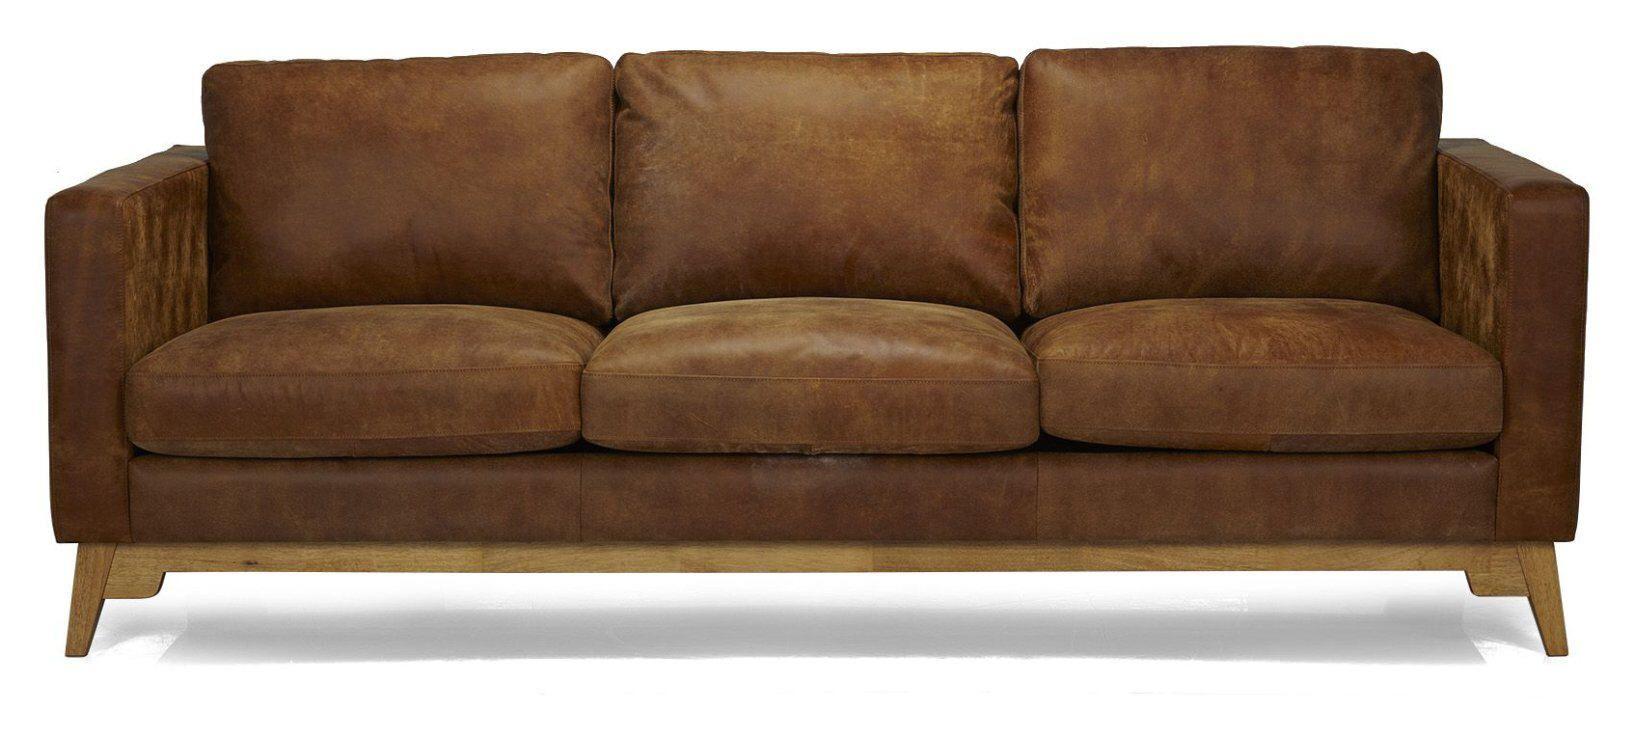 Épinglé Sur Sofa concernant Alinea Canape Cuir